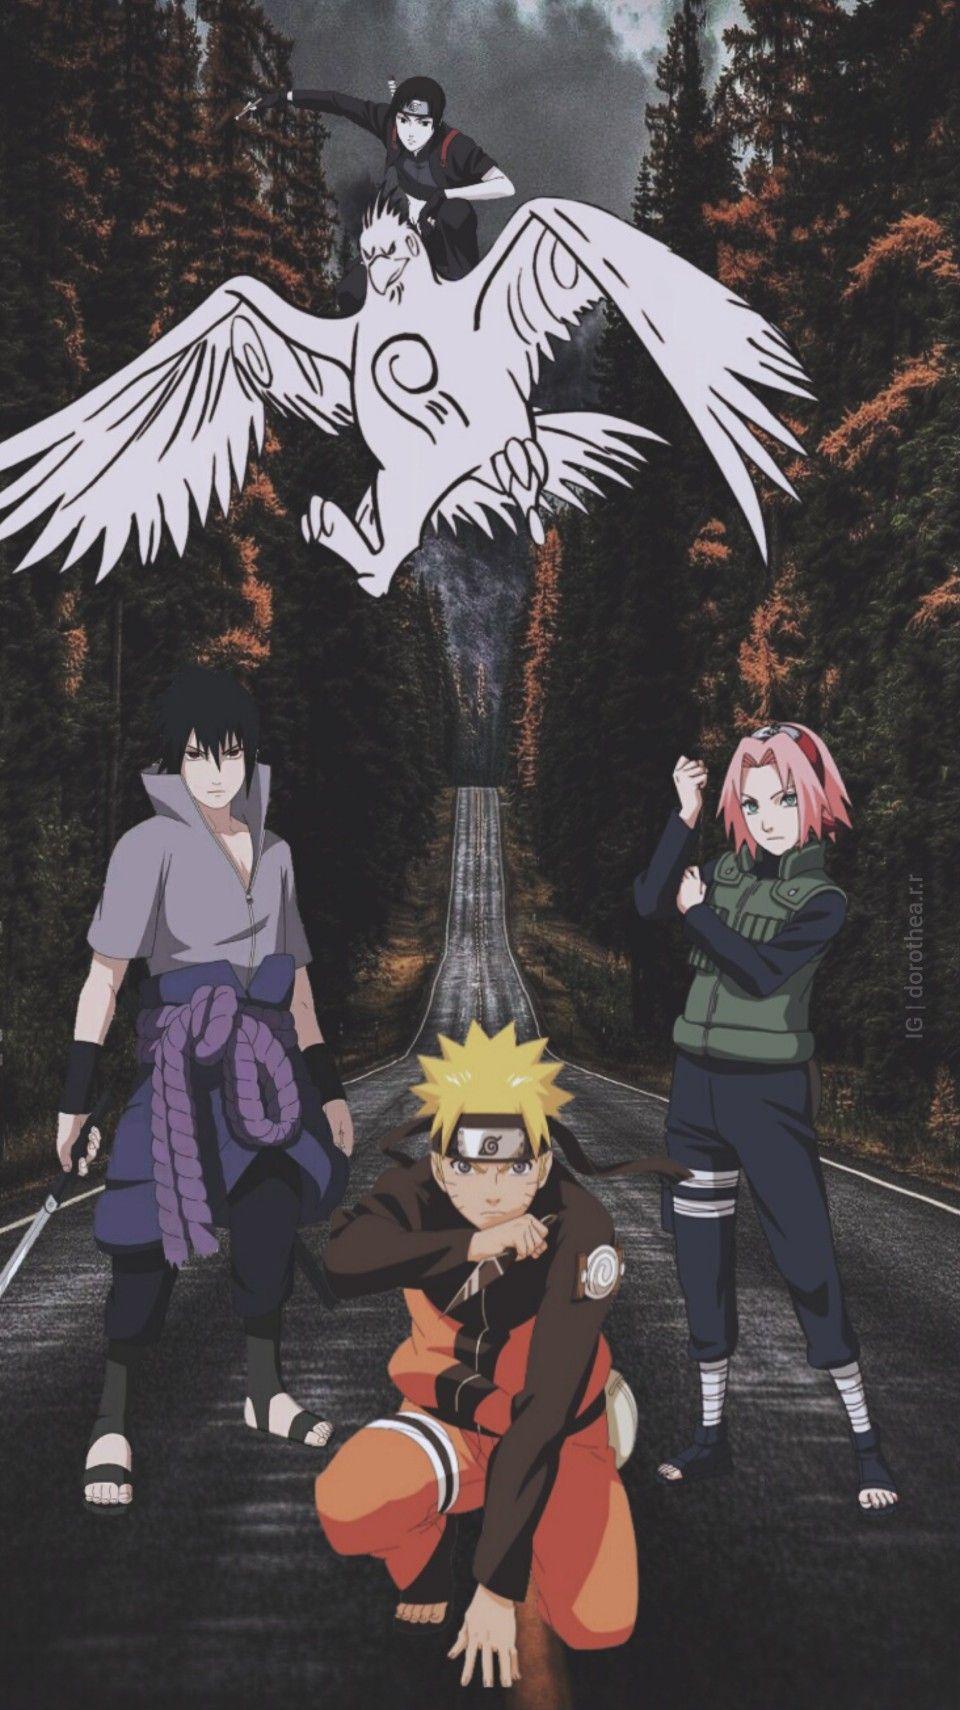 Naruto Team 7 Wallpaper Wallpaper Naruto Shippuden Naruto Characters Naruto Teams